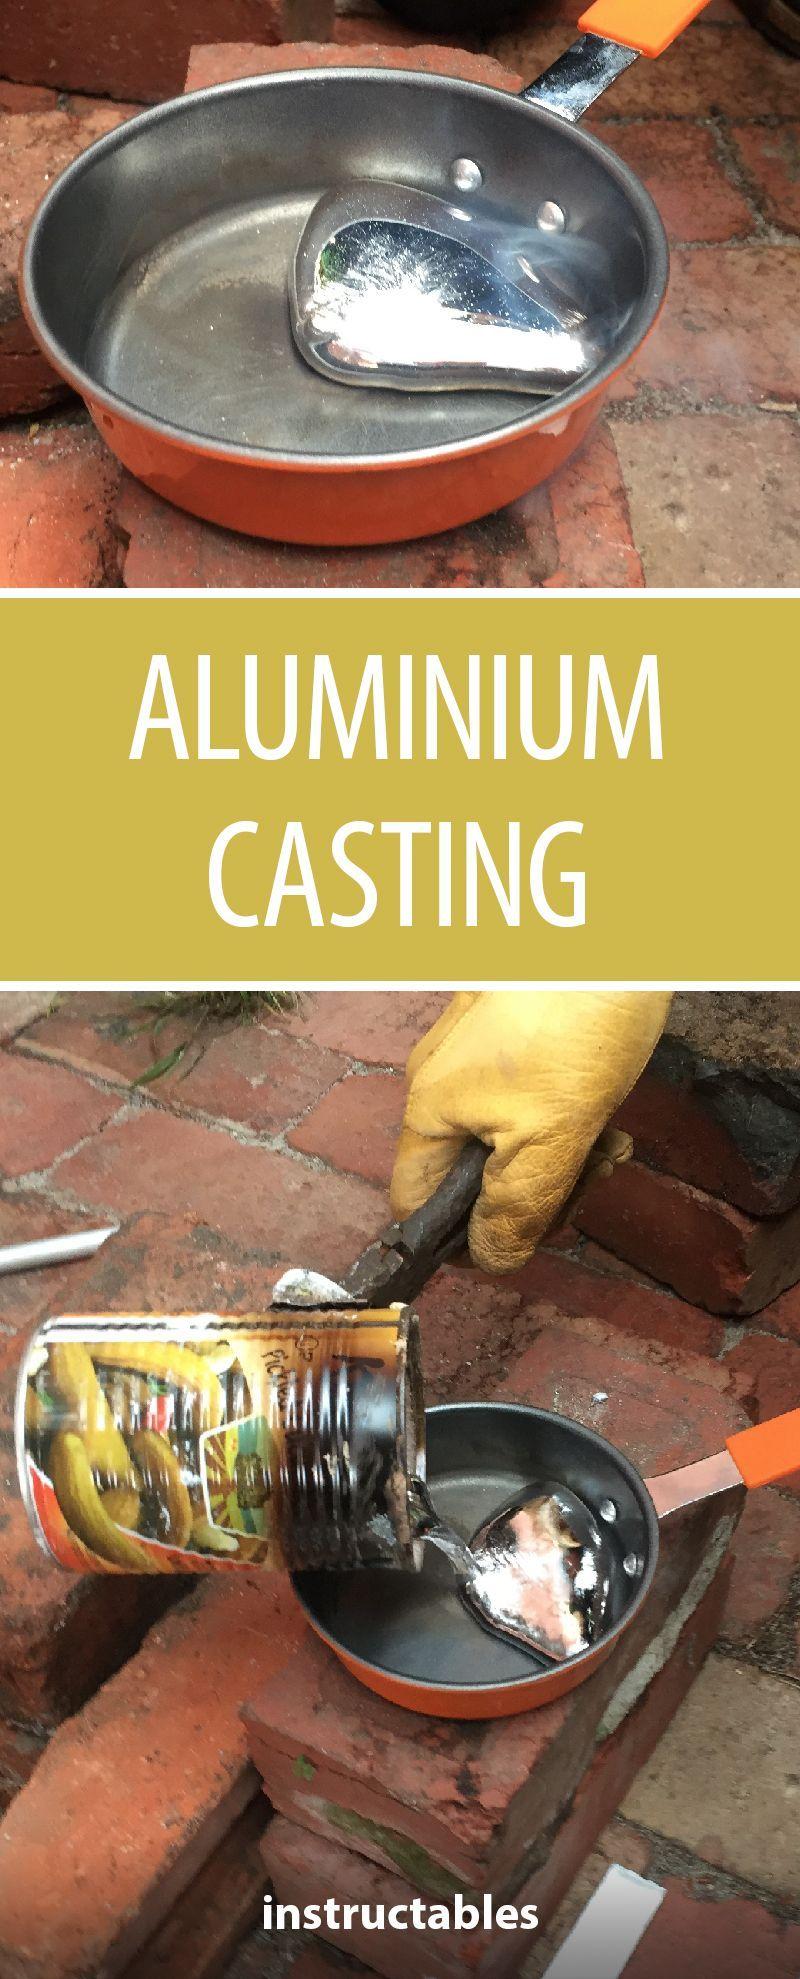 Diy Aluminium Melting Techniques And Skills Metal